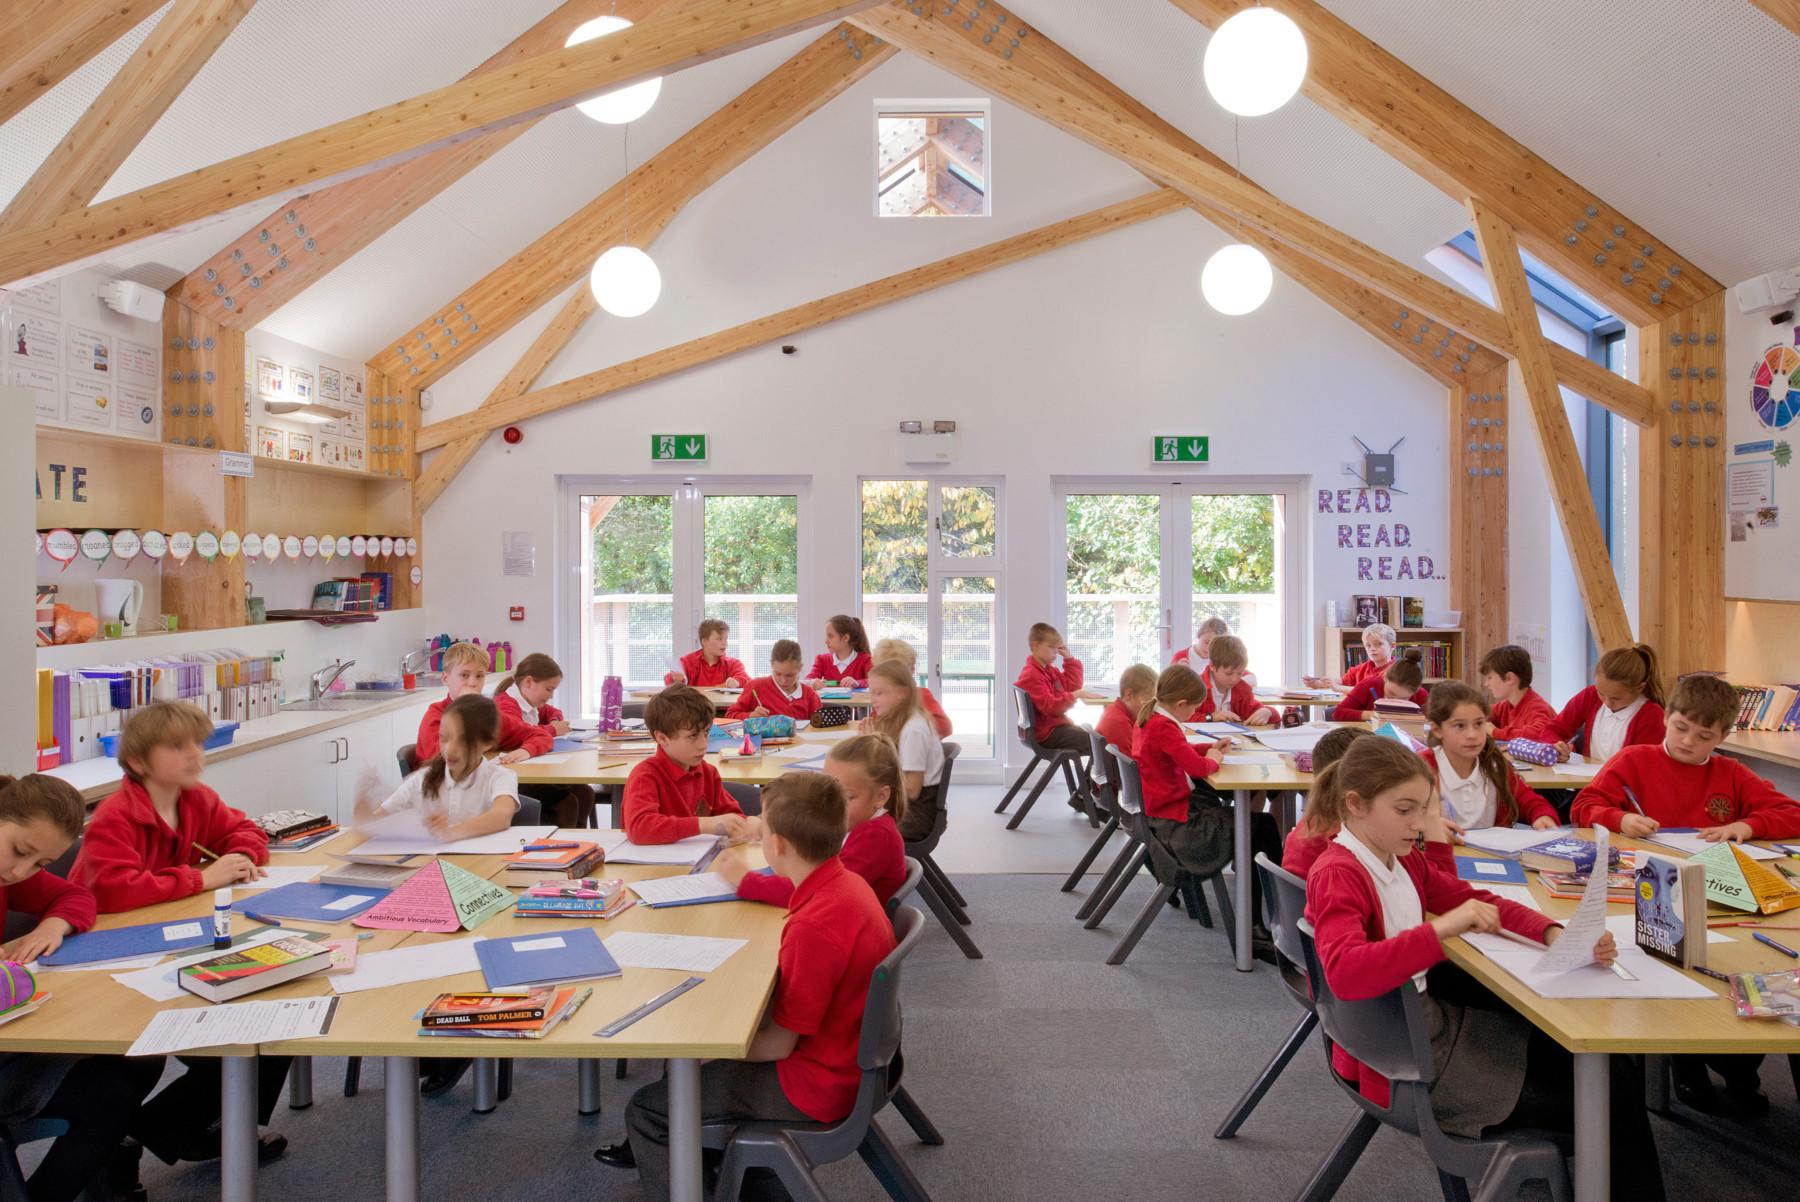 Sarah-Wigglesworth-Architects Mellor Classroom 3600